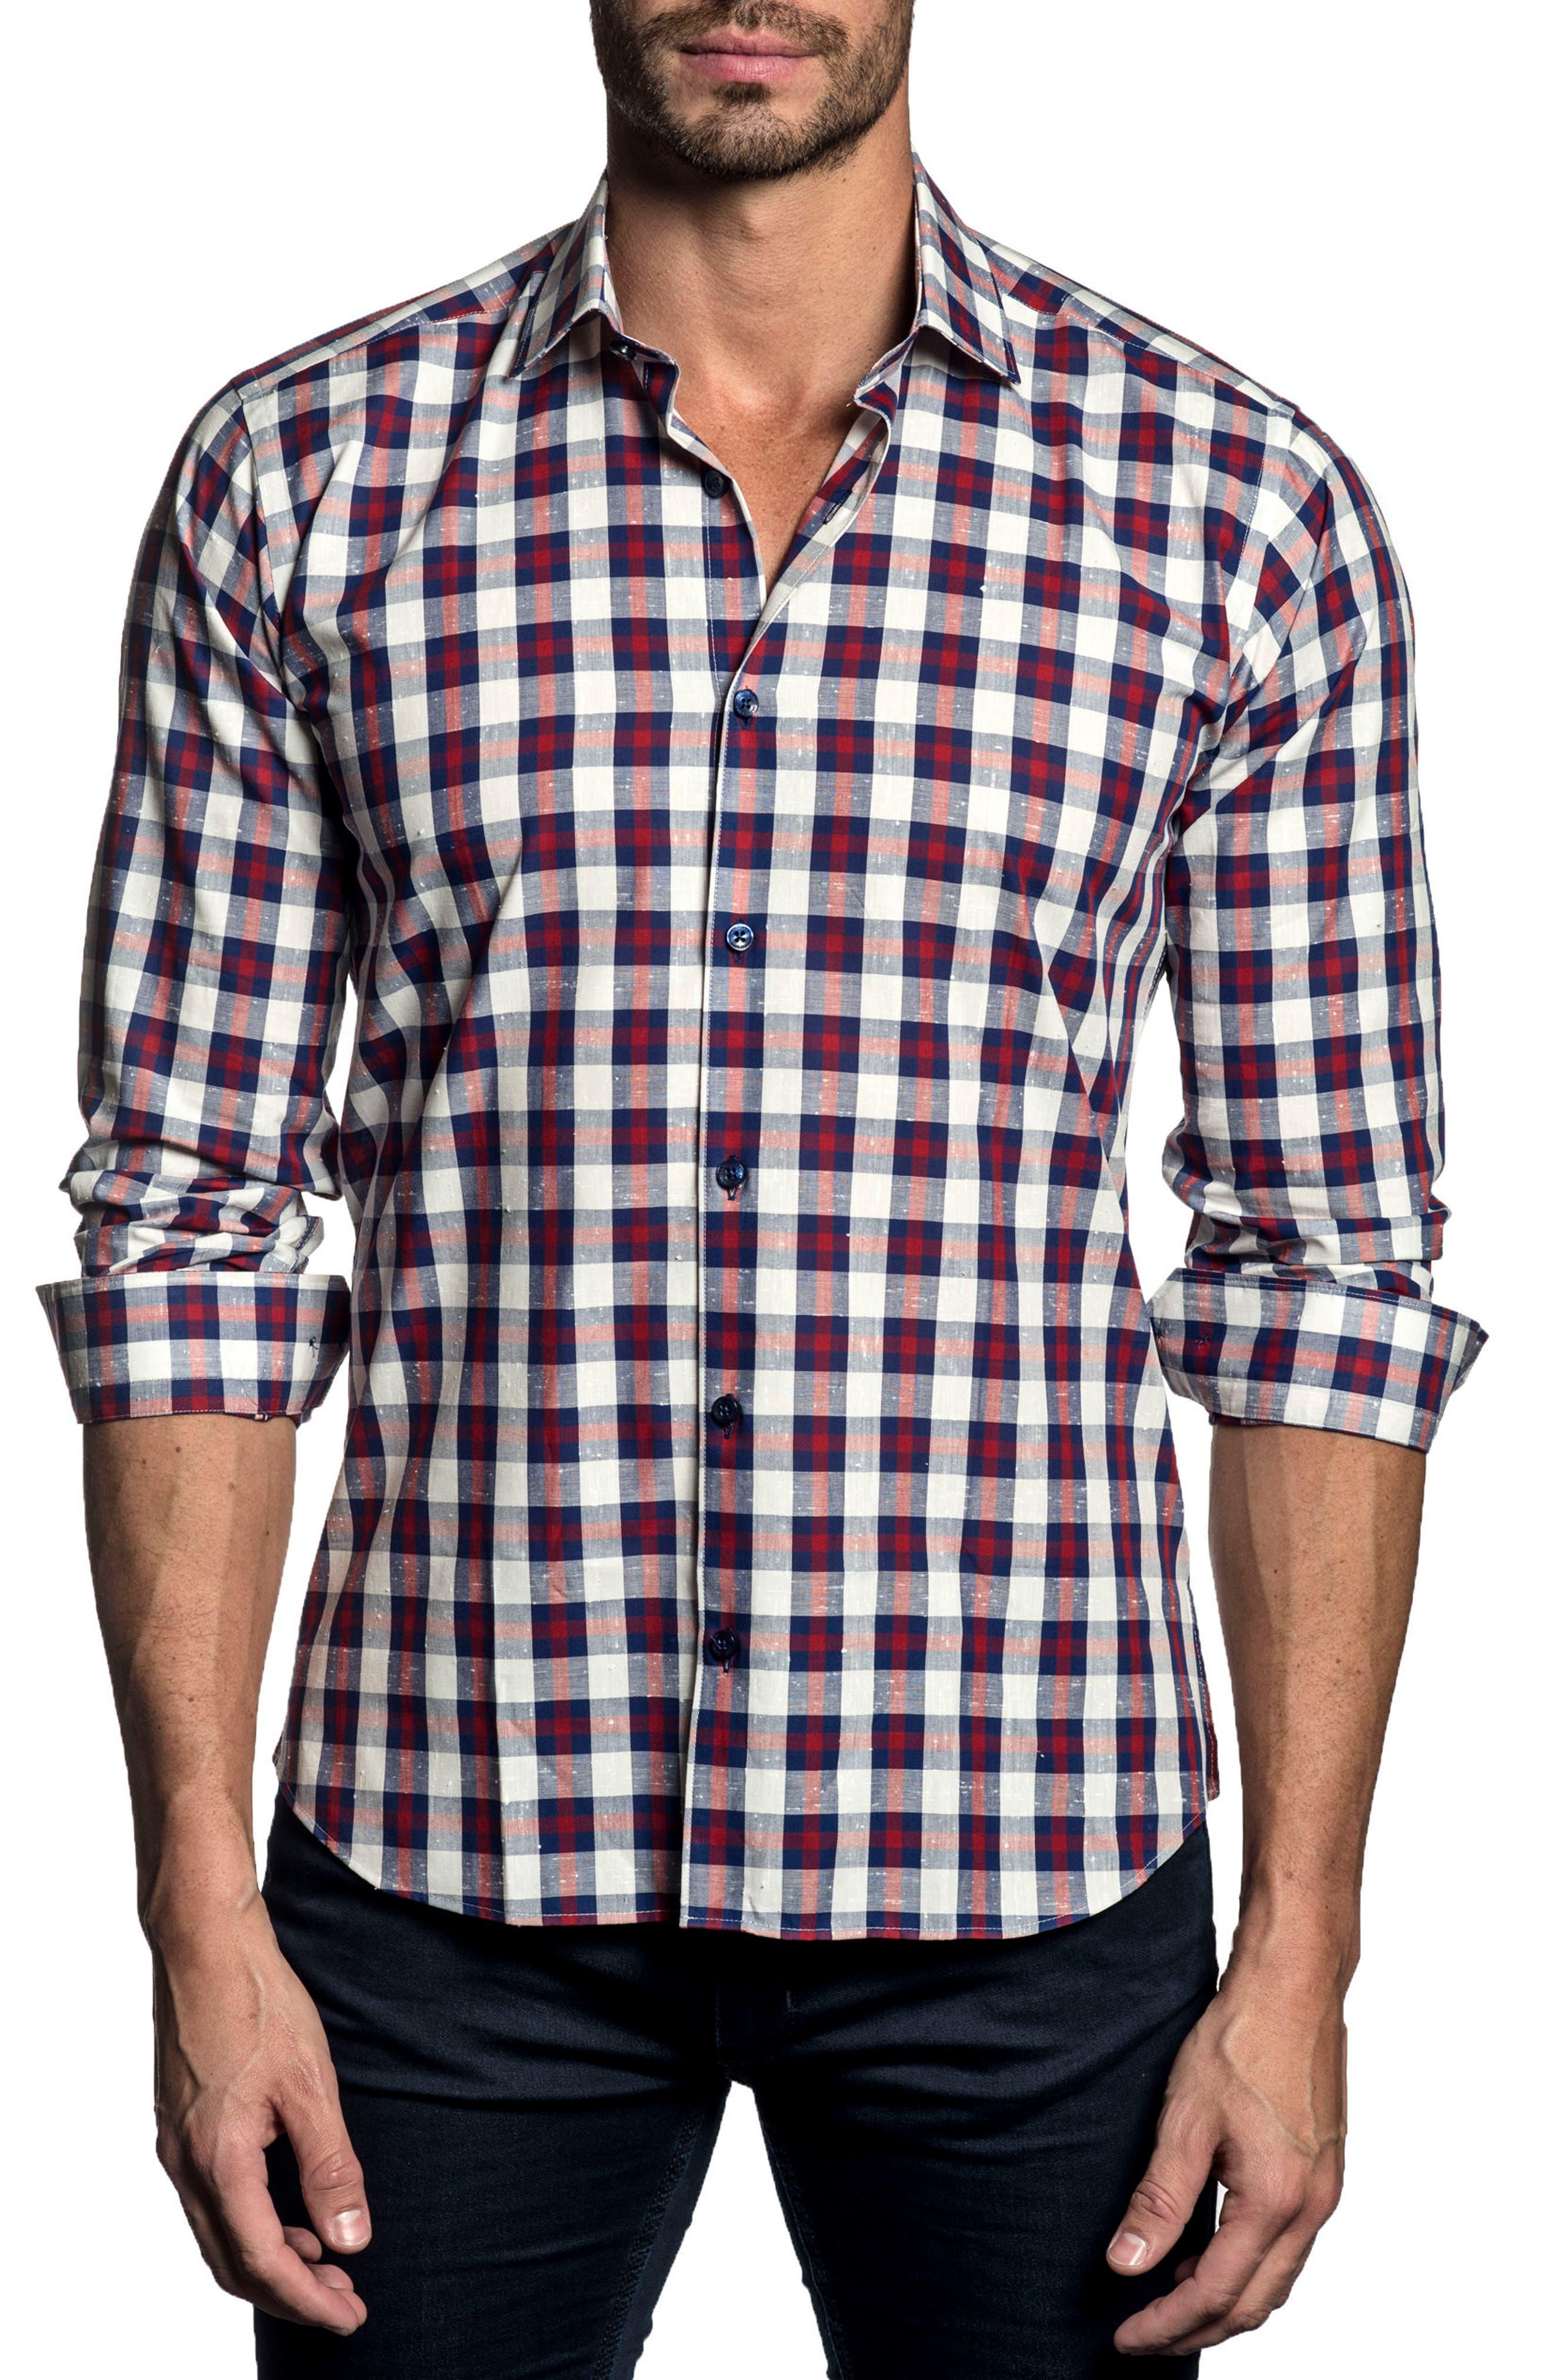 Trim Fit Plaid Sport Shirt,                         Main,                         color, White - Blue - Red Check